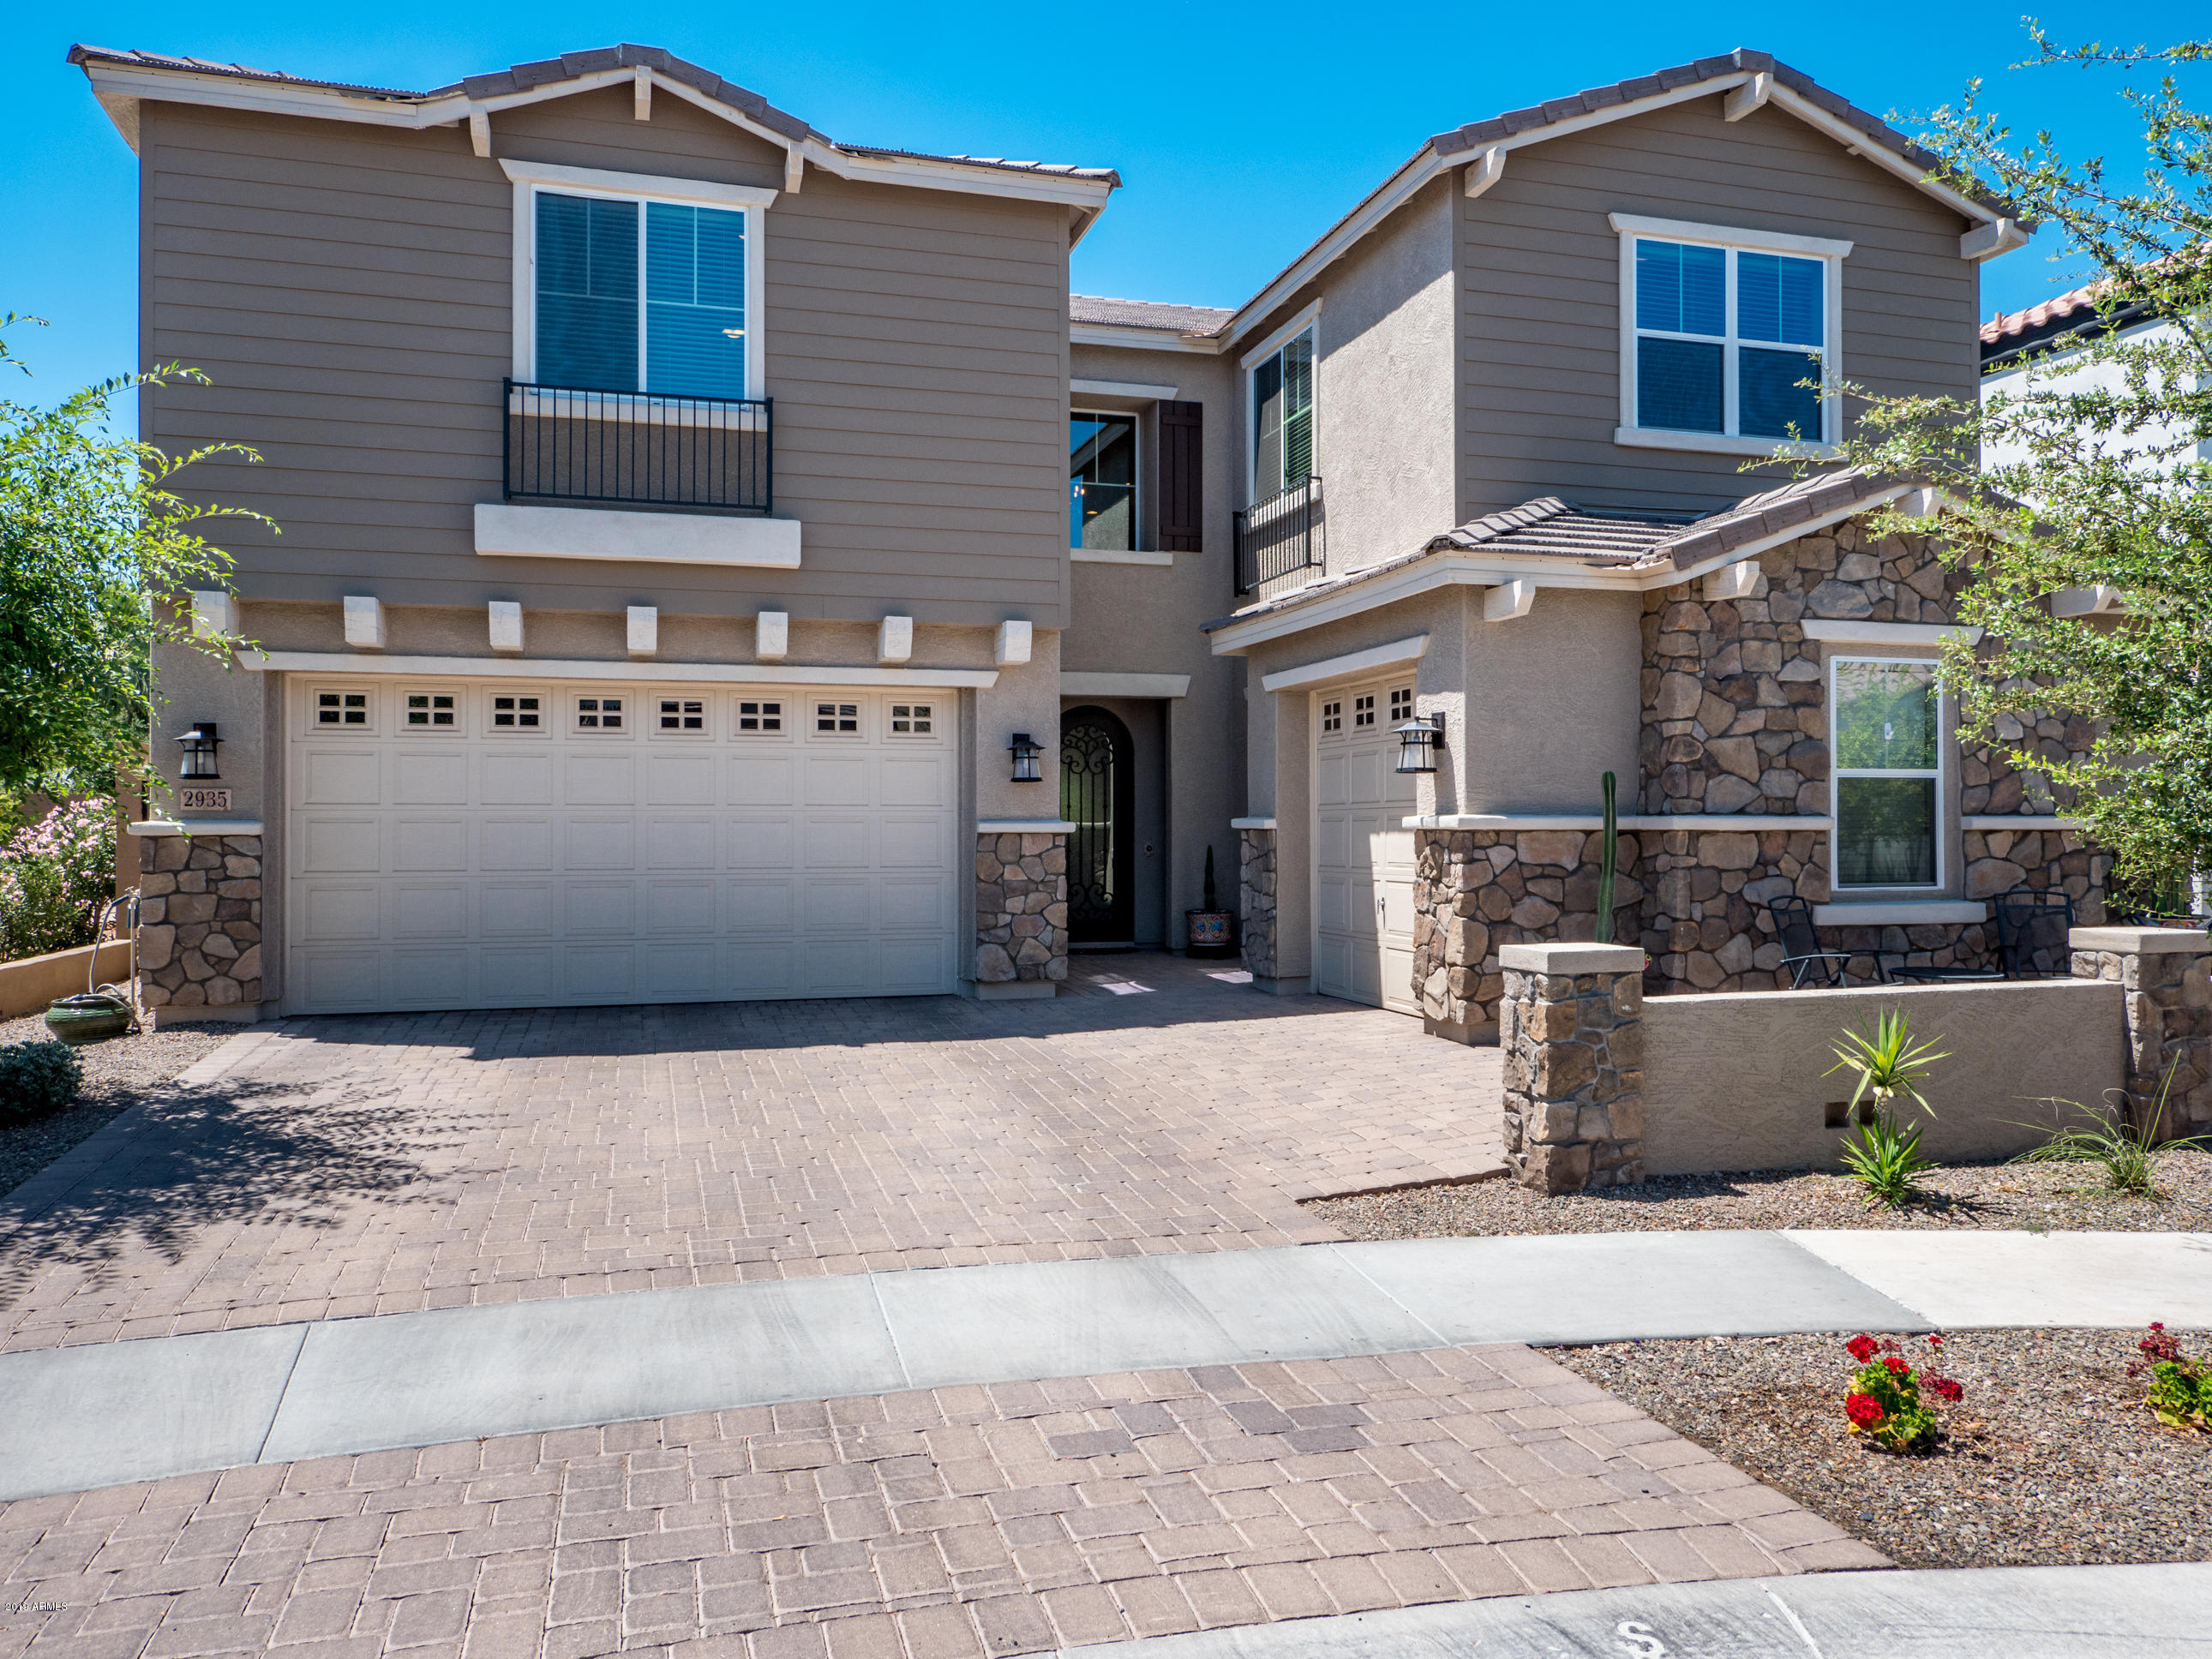 Photo of 2935 E MADISON VISTAS Drive, Phoenix, AZ 85016